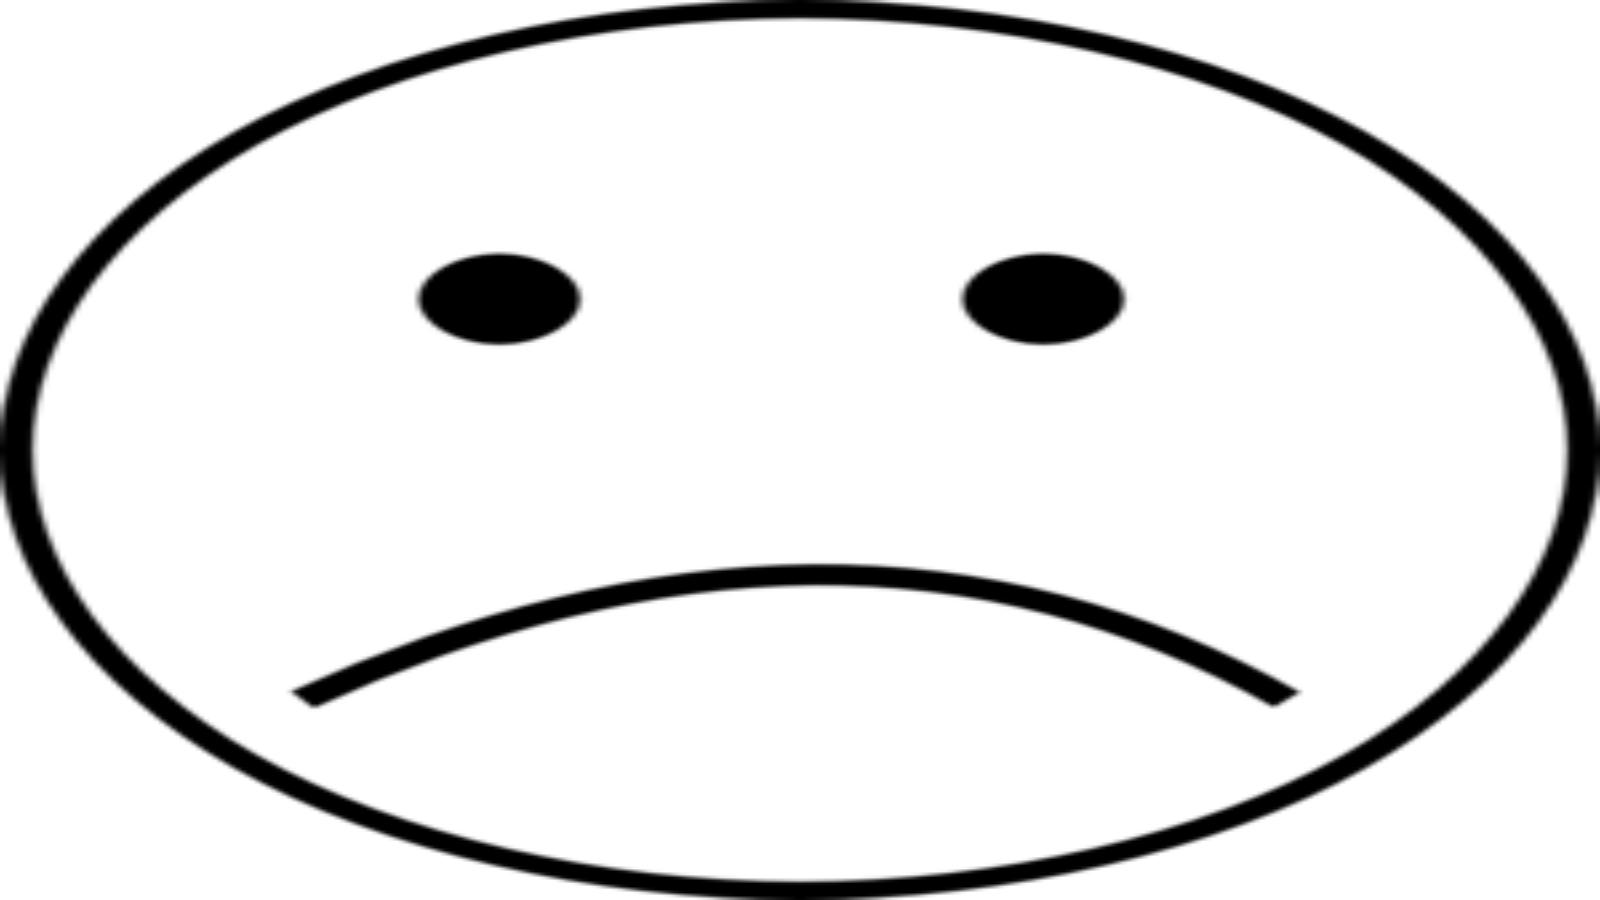 Sad face emoji clipart black and white image transparent stock Sad Face Black And White | Free download best Sad Face Black ... image transparent stock